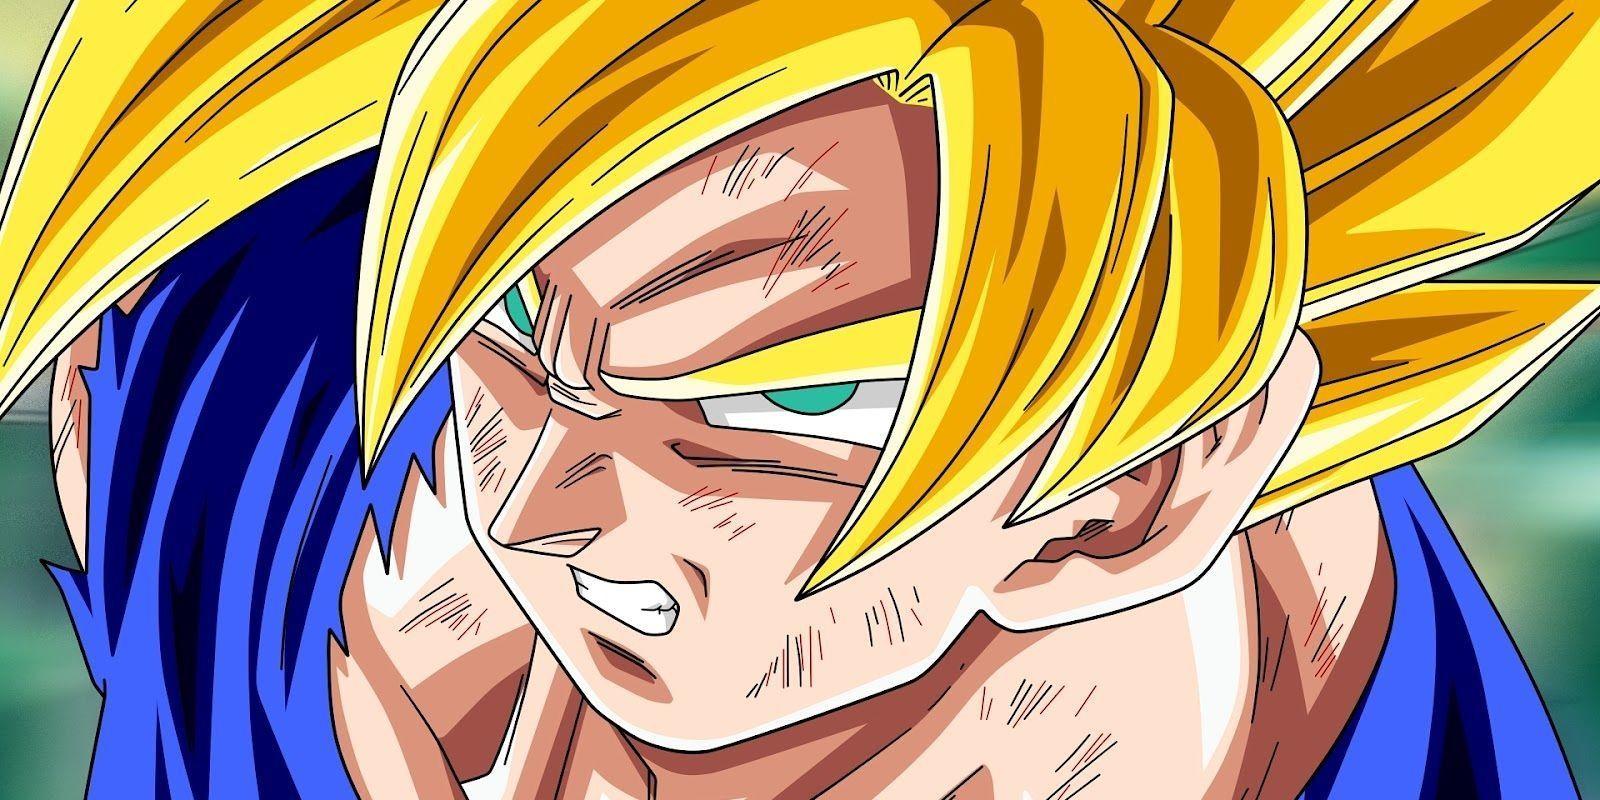 Goku-Super-Saiyan-Dragon-Ball-Z.jpg